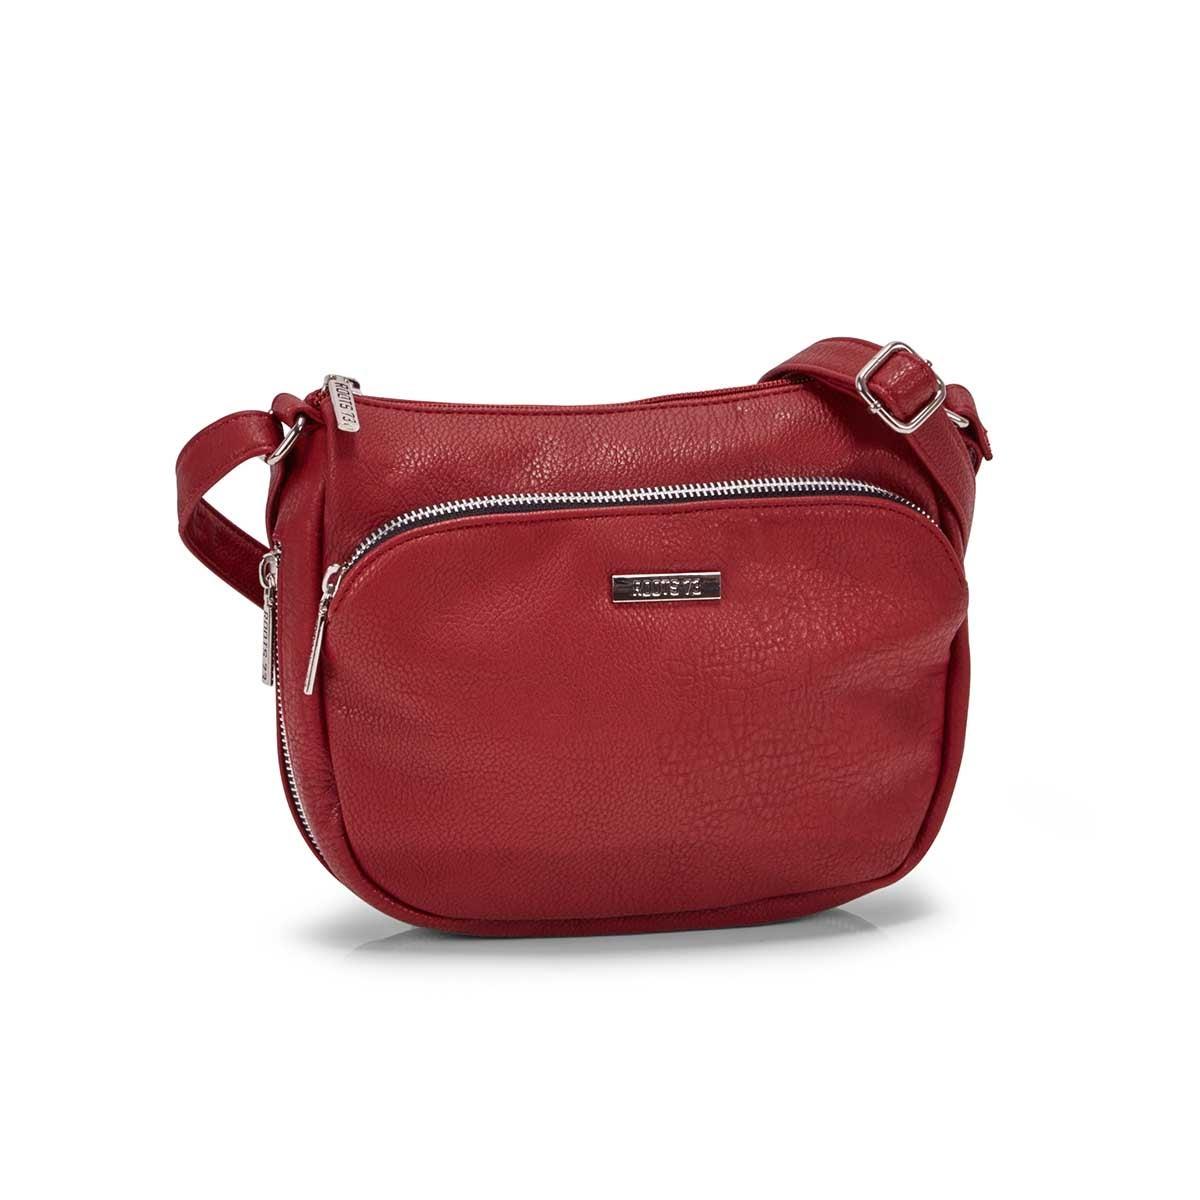 Women's R5209 red crossbody bag